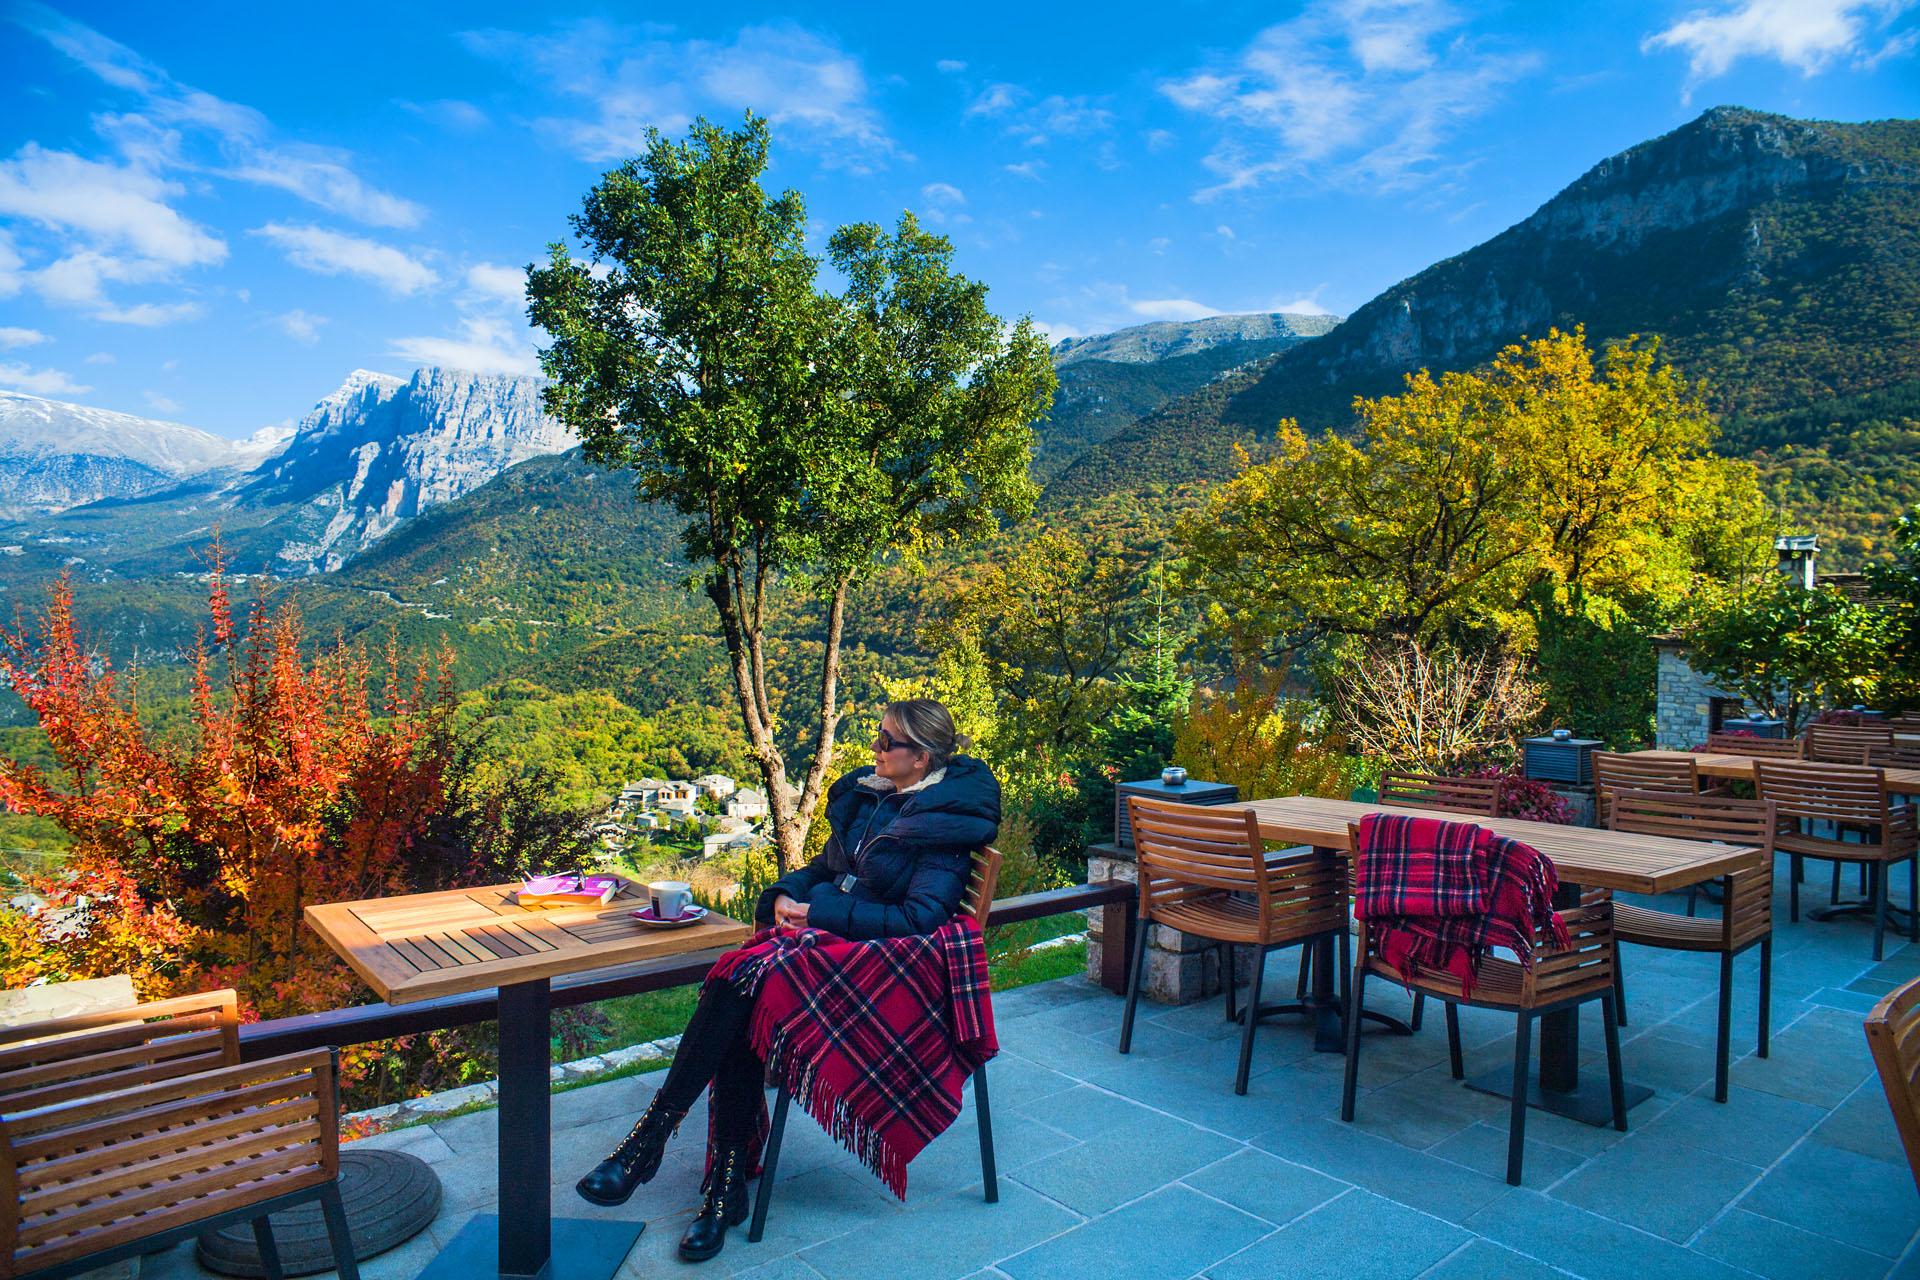 aristi mountain resort - costas zissis photography